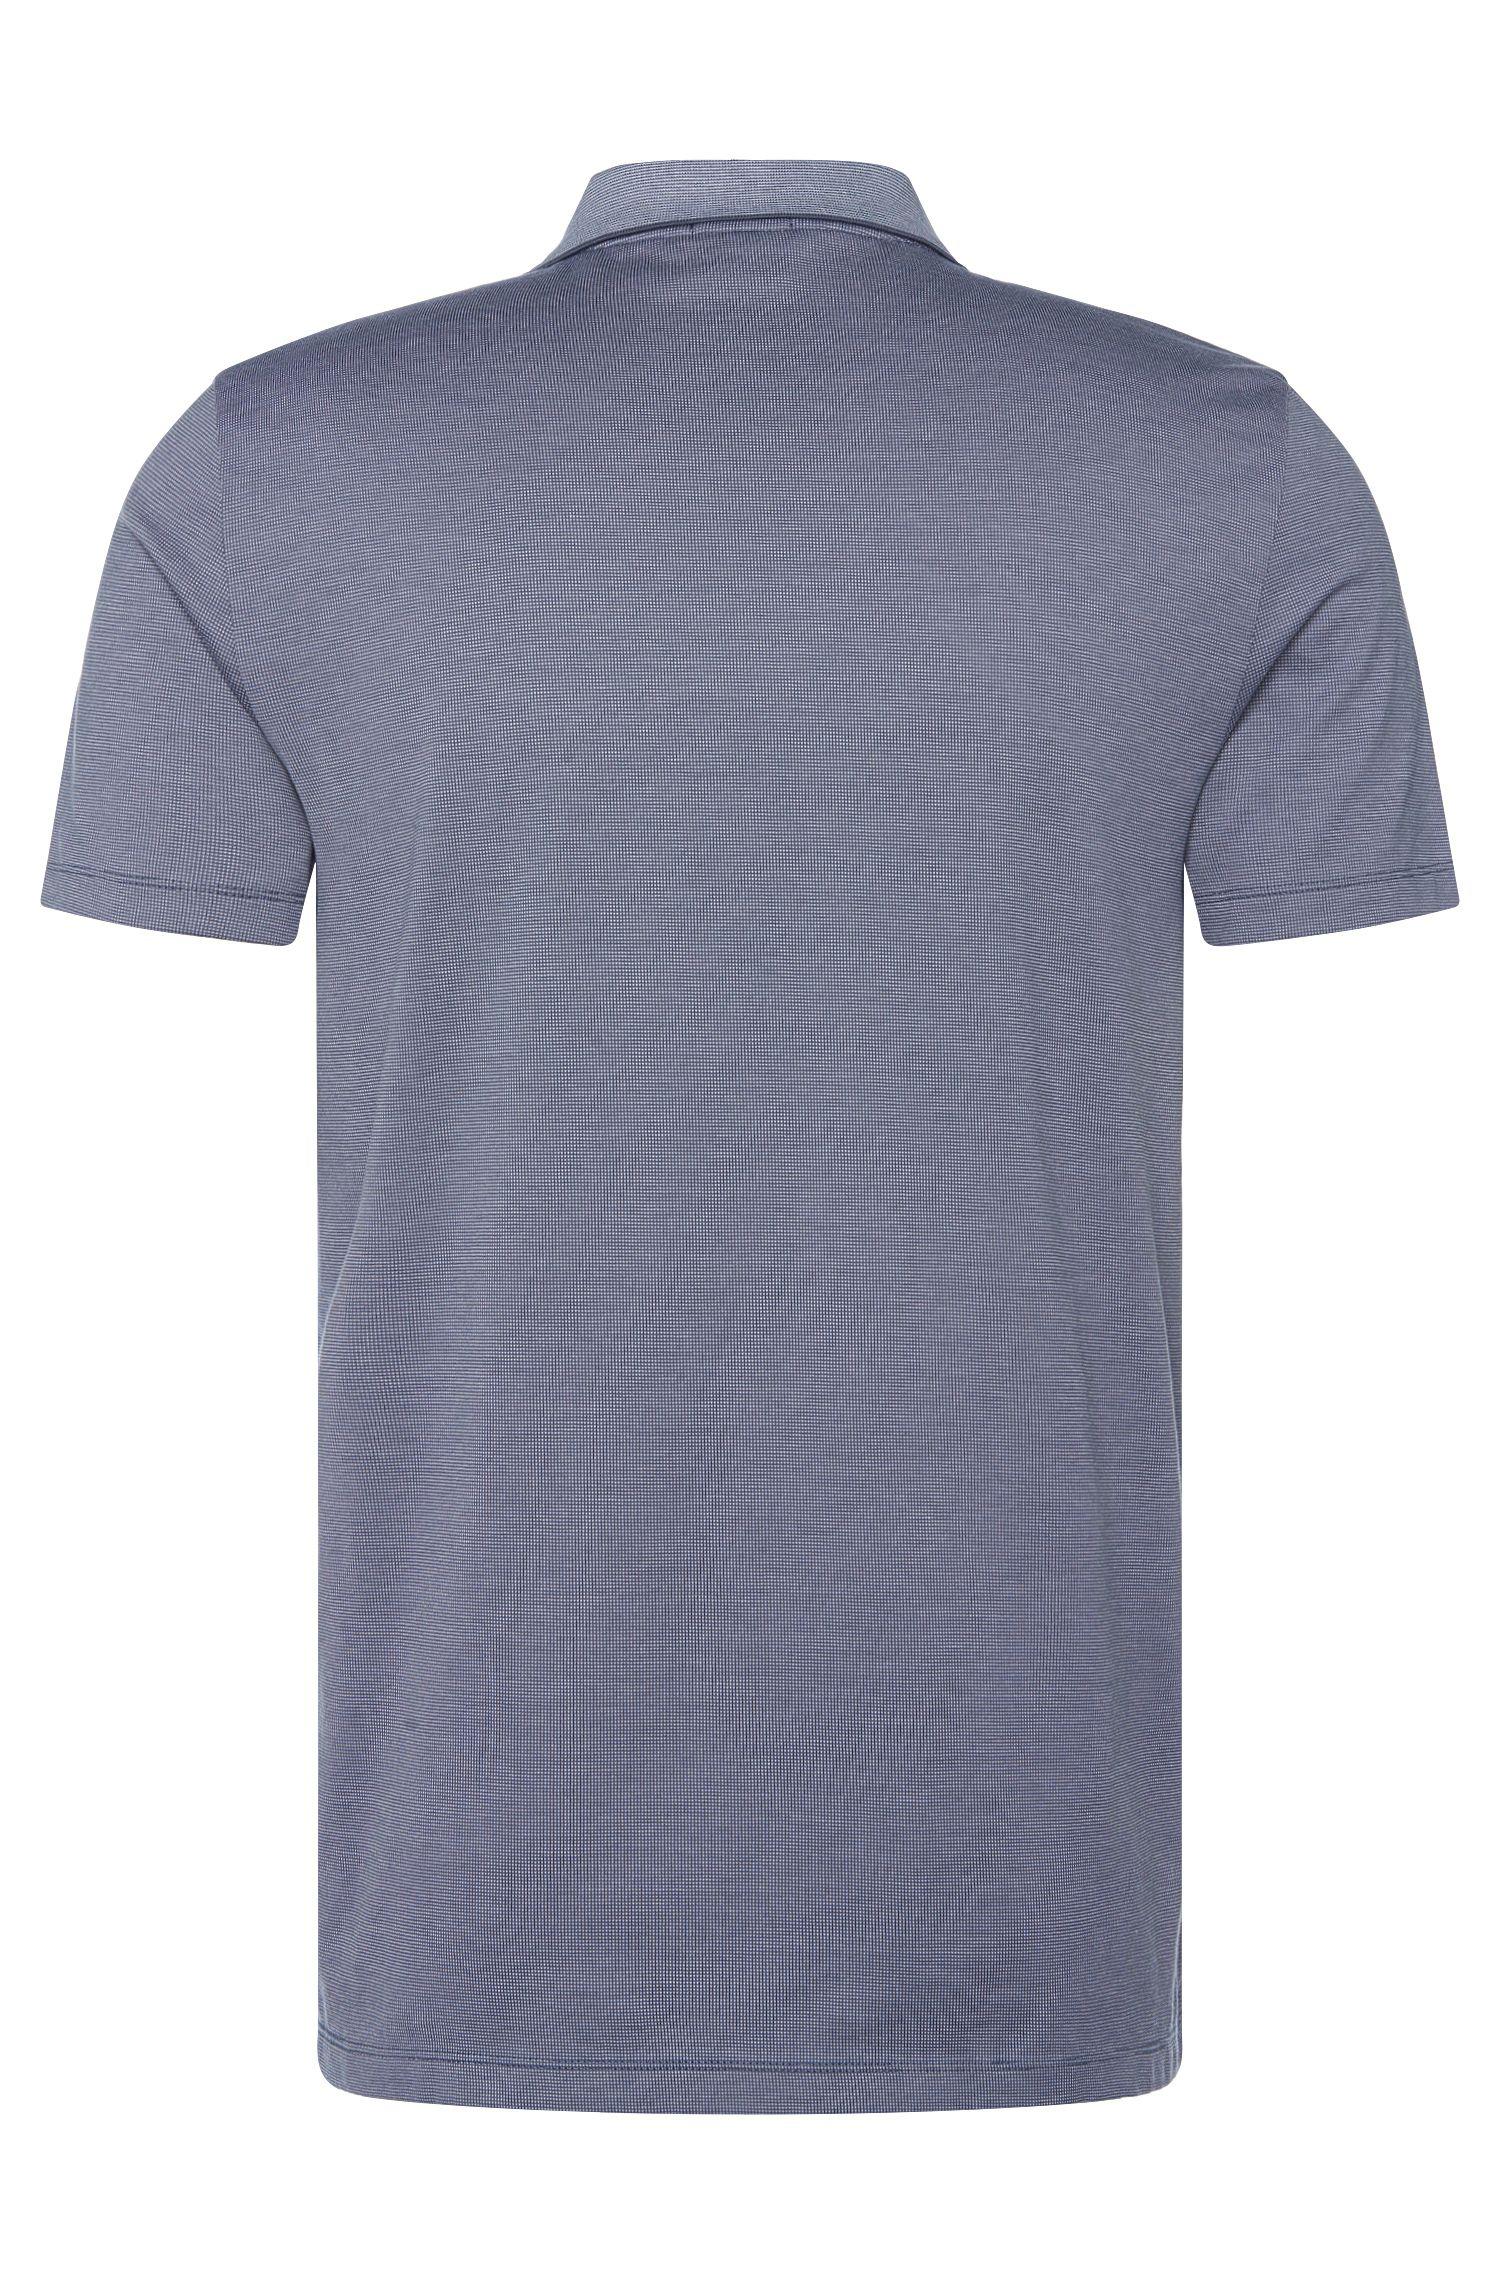 Fein gemustertes Regular-Fit Poloshirt aus Baumwolle: 'Parlay 07'